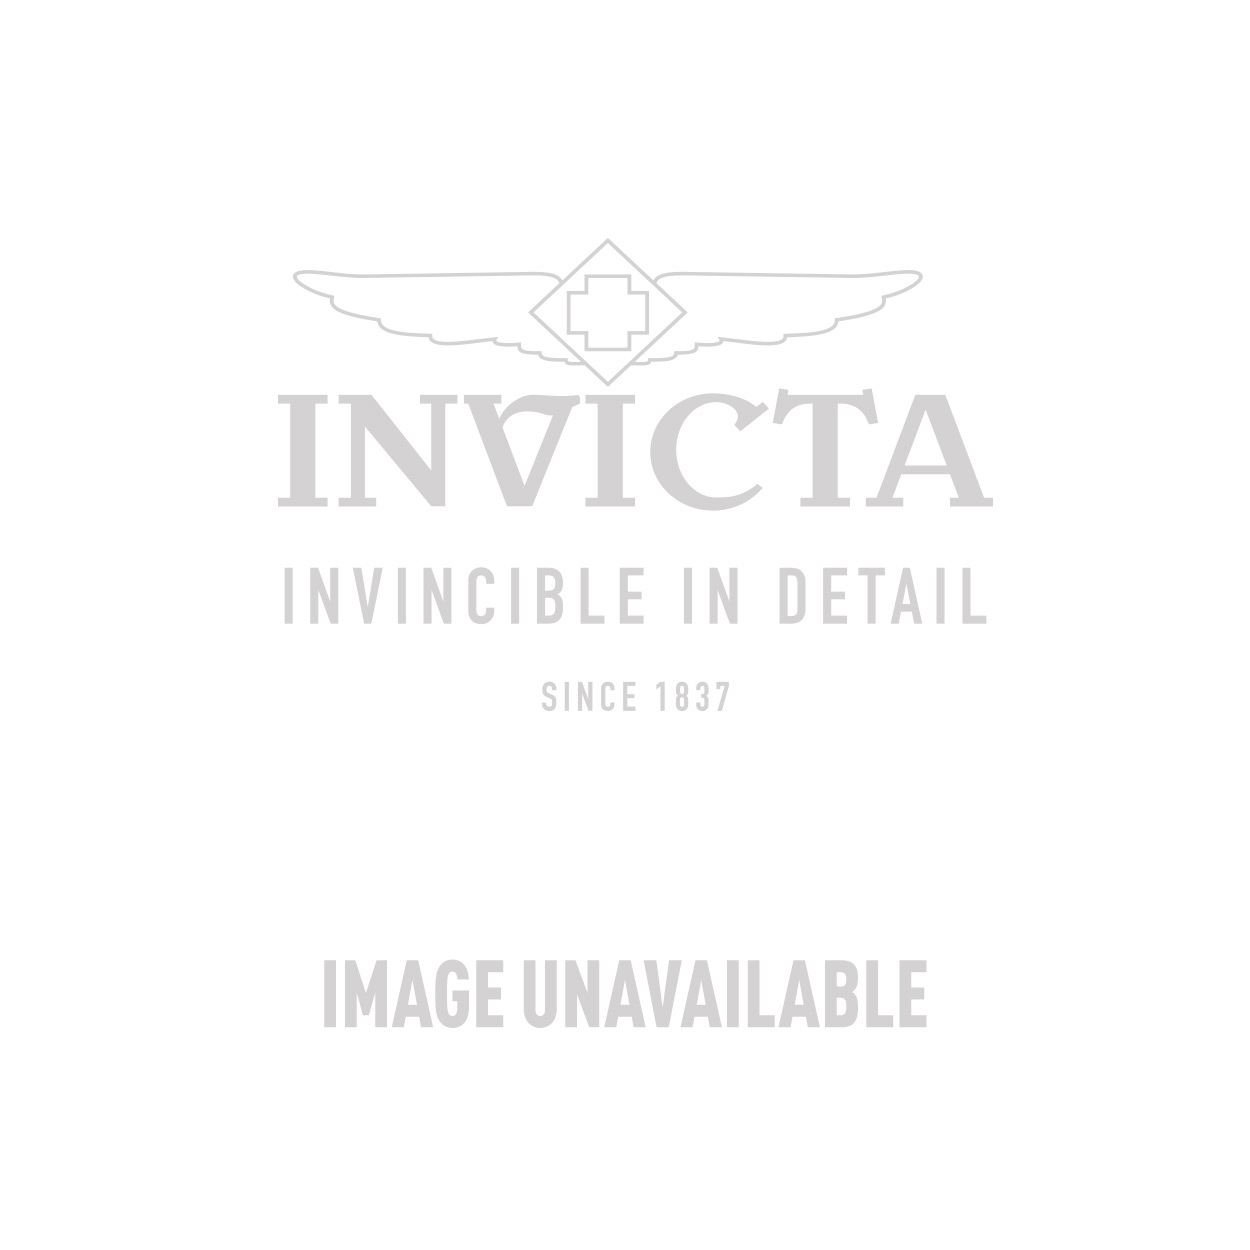 Invicta Corduba Swiss Movement Quartz Watch - Gold case with Black tone Polyurethane band - Model 18833